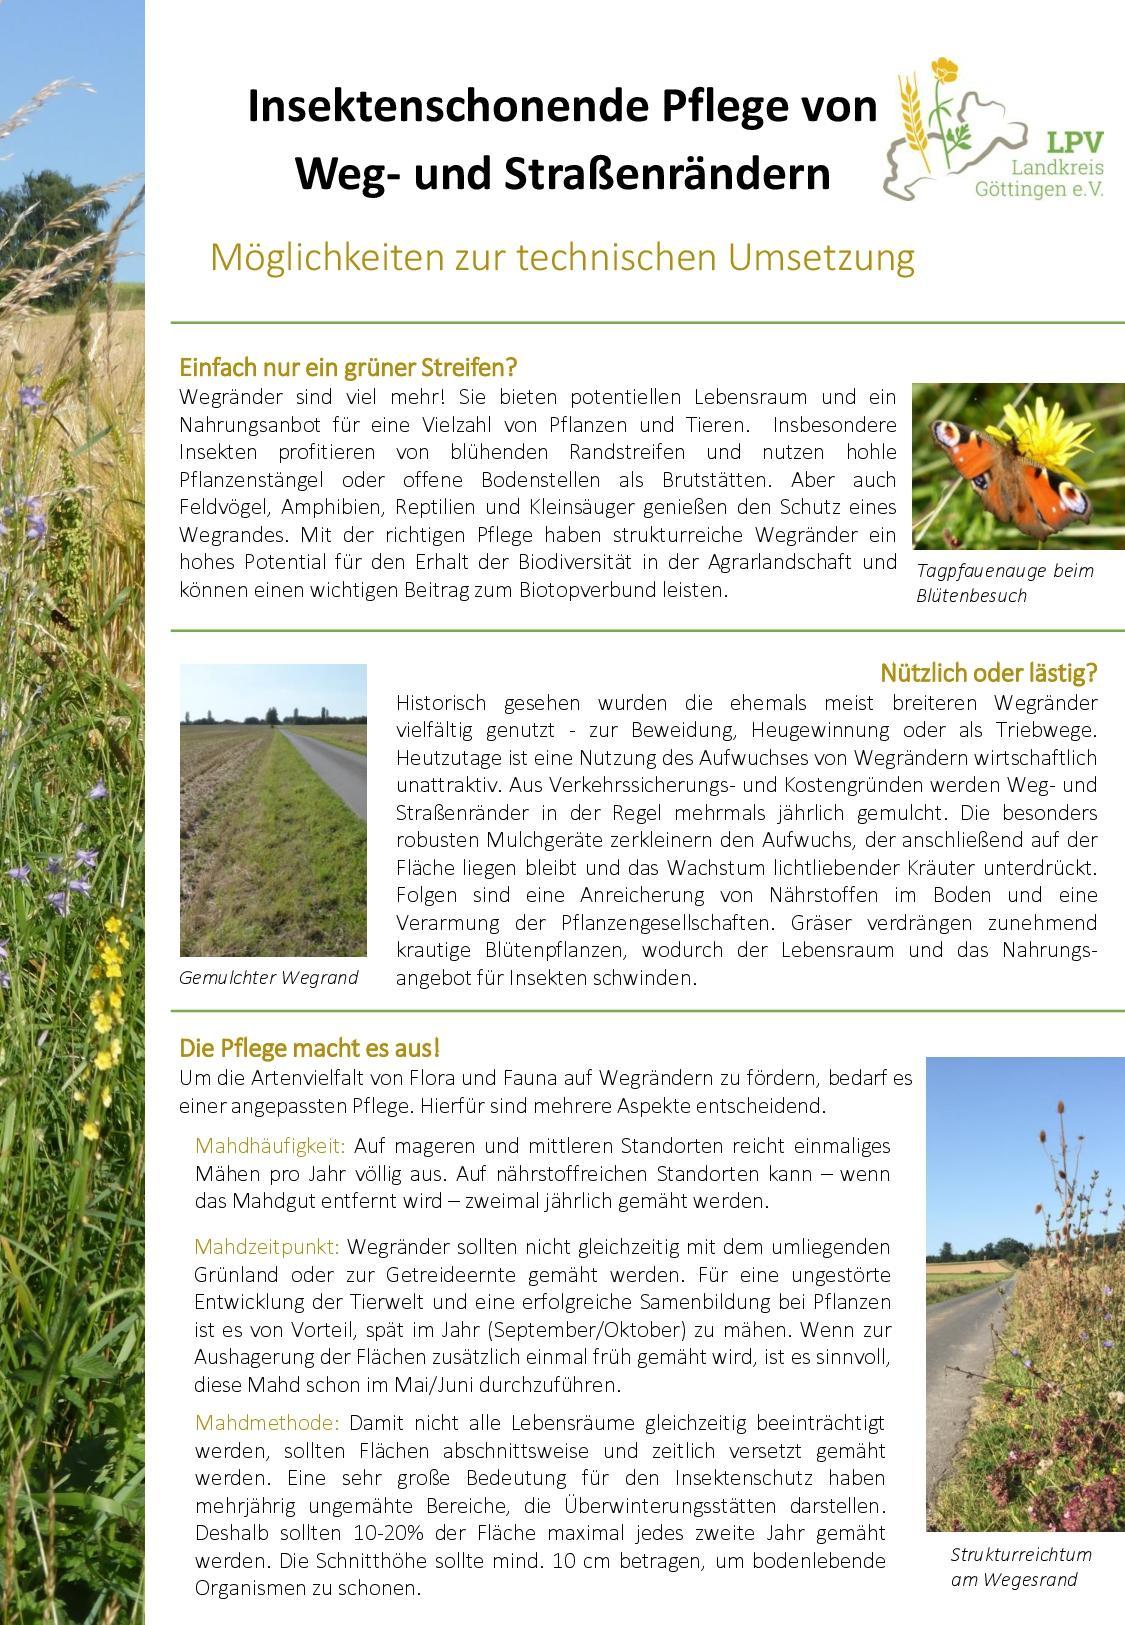 Vorschau_Infoblatt_Mahdtechnik